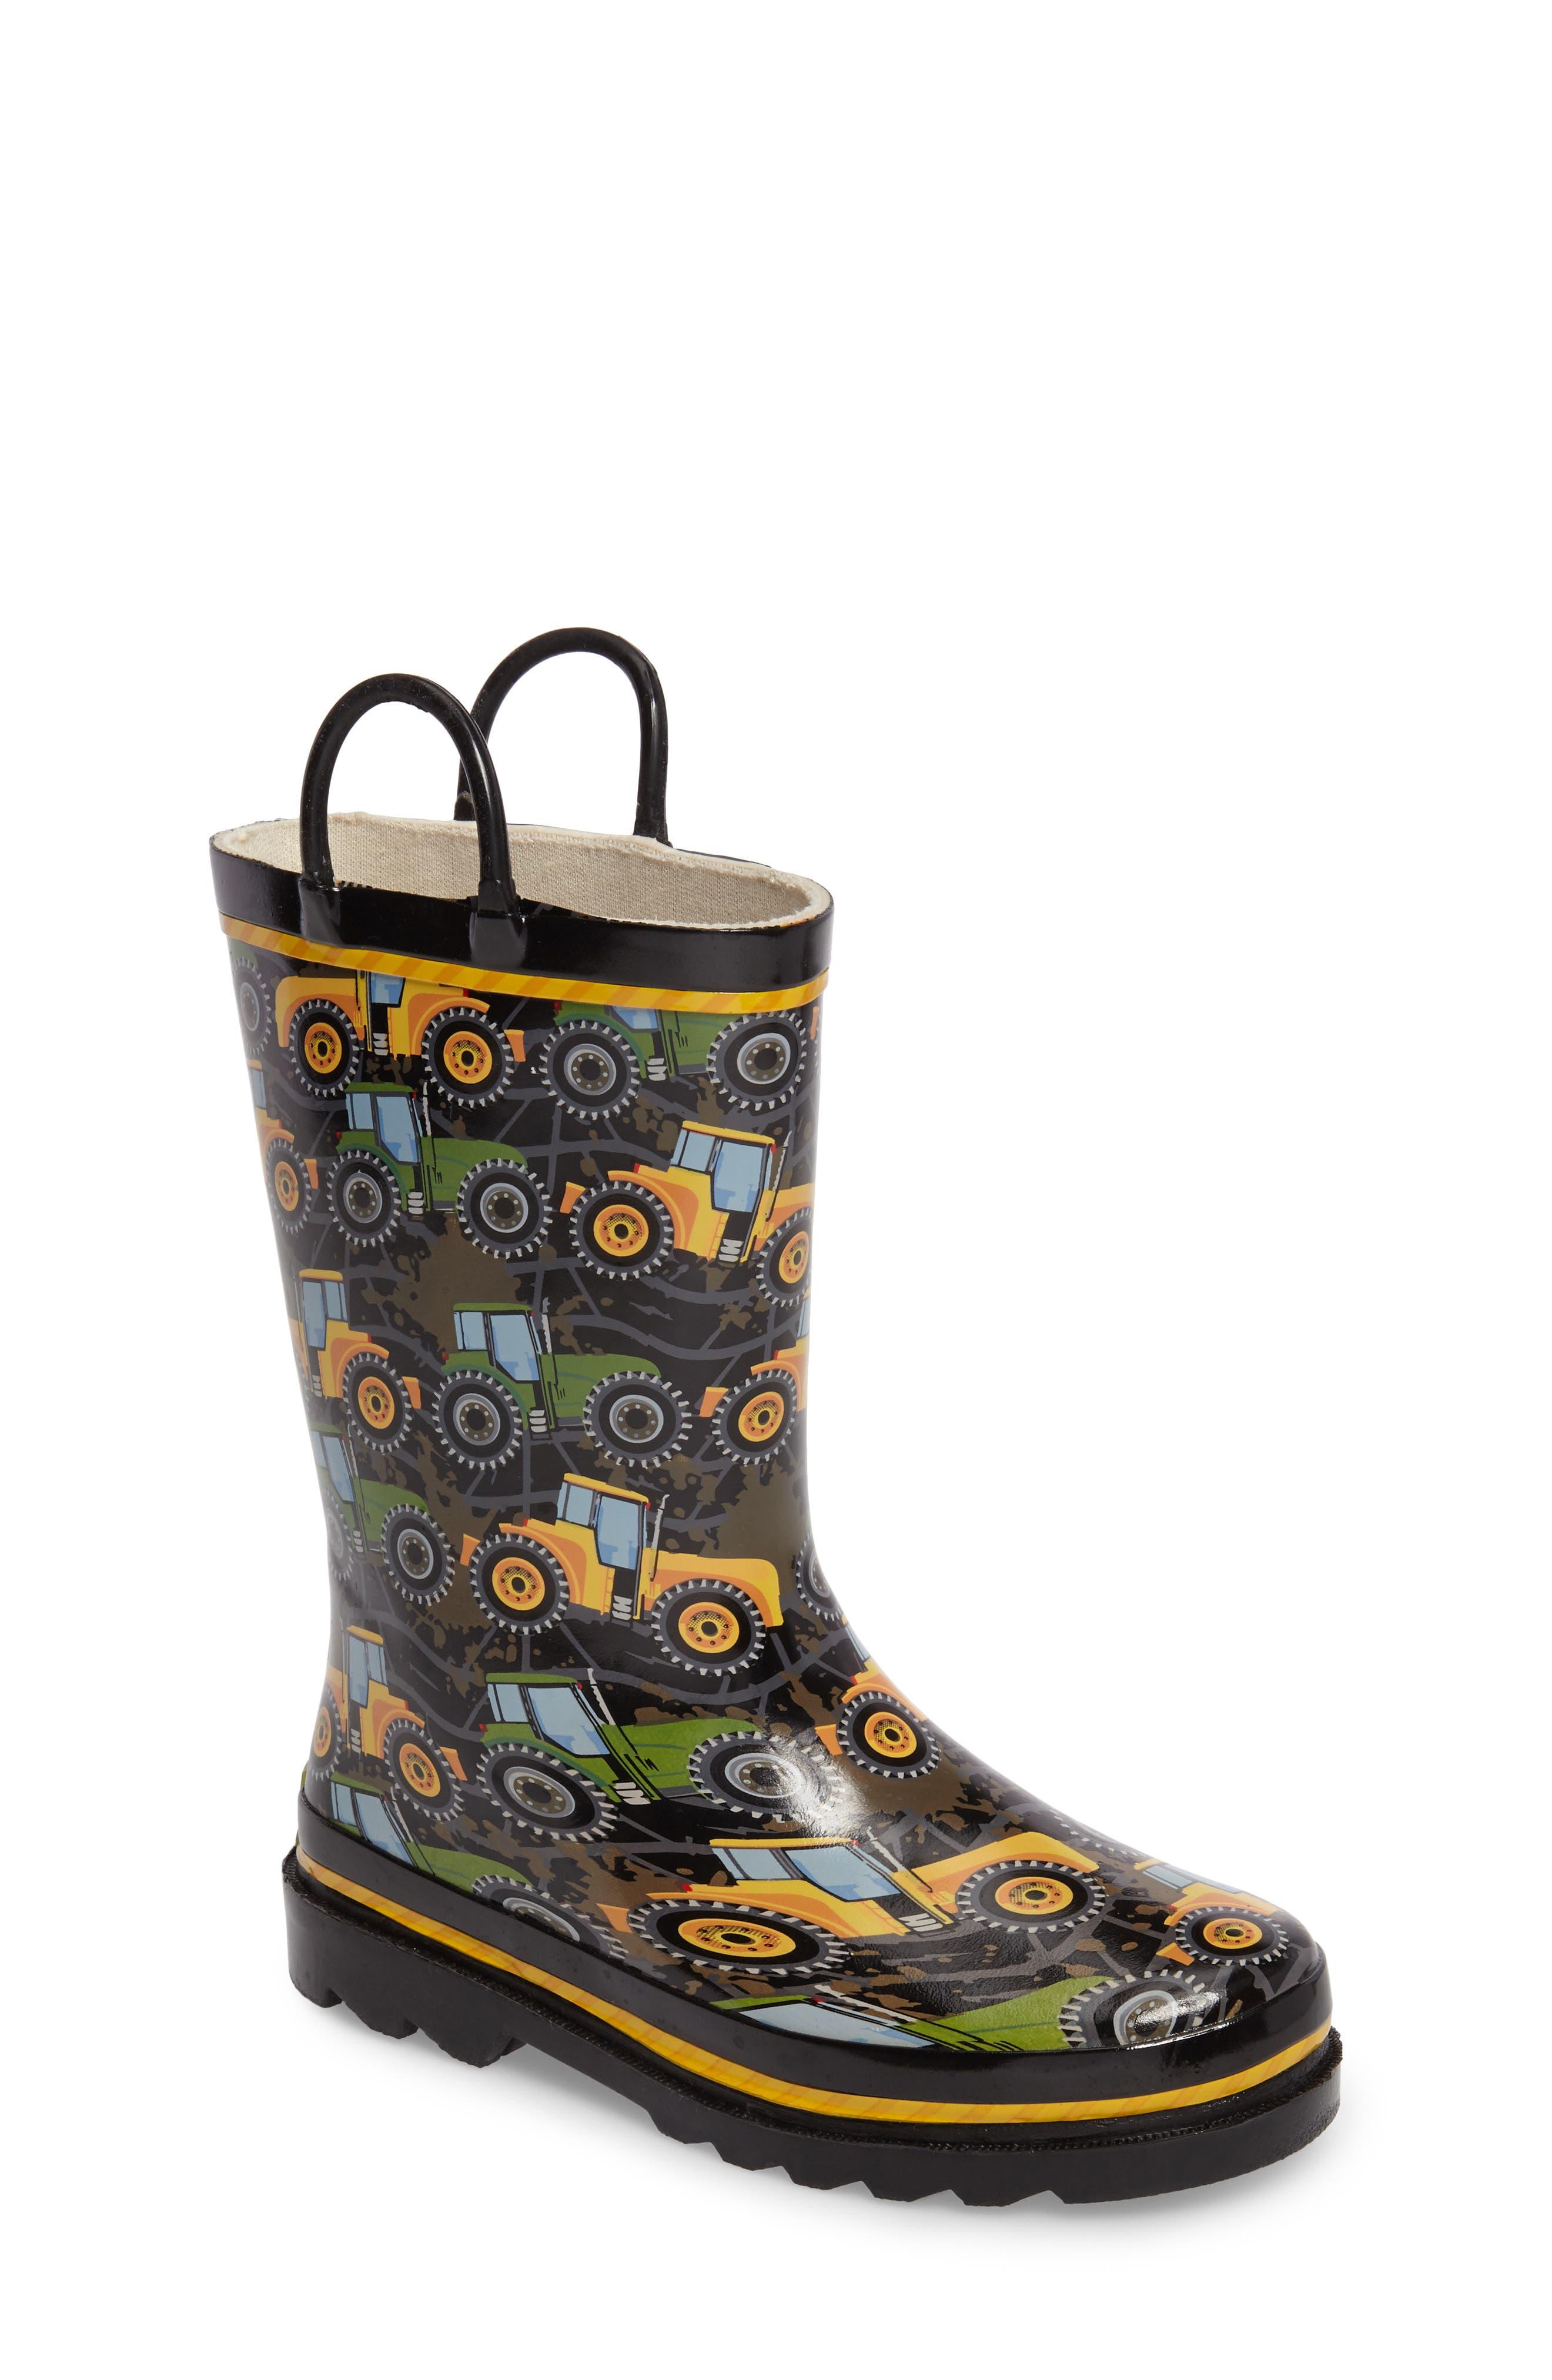 Tractor Tough Rain Boot,                             Main thumbnail 1, color,                             001